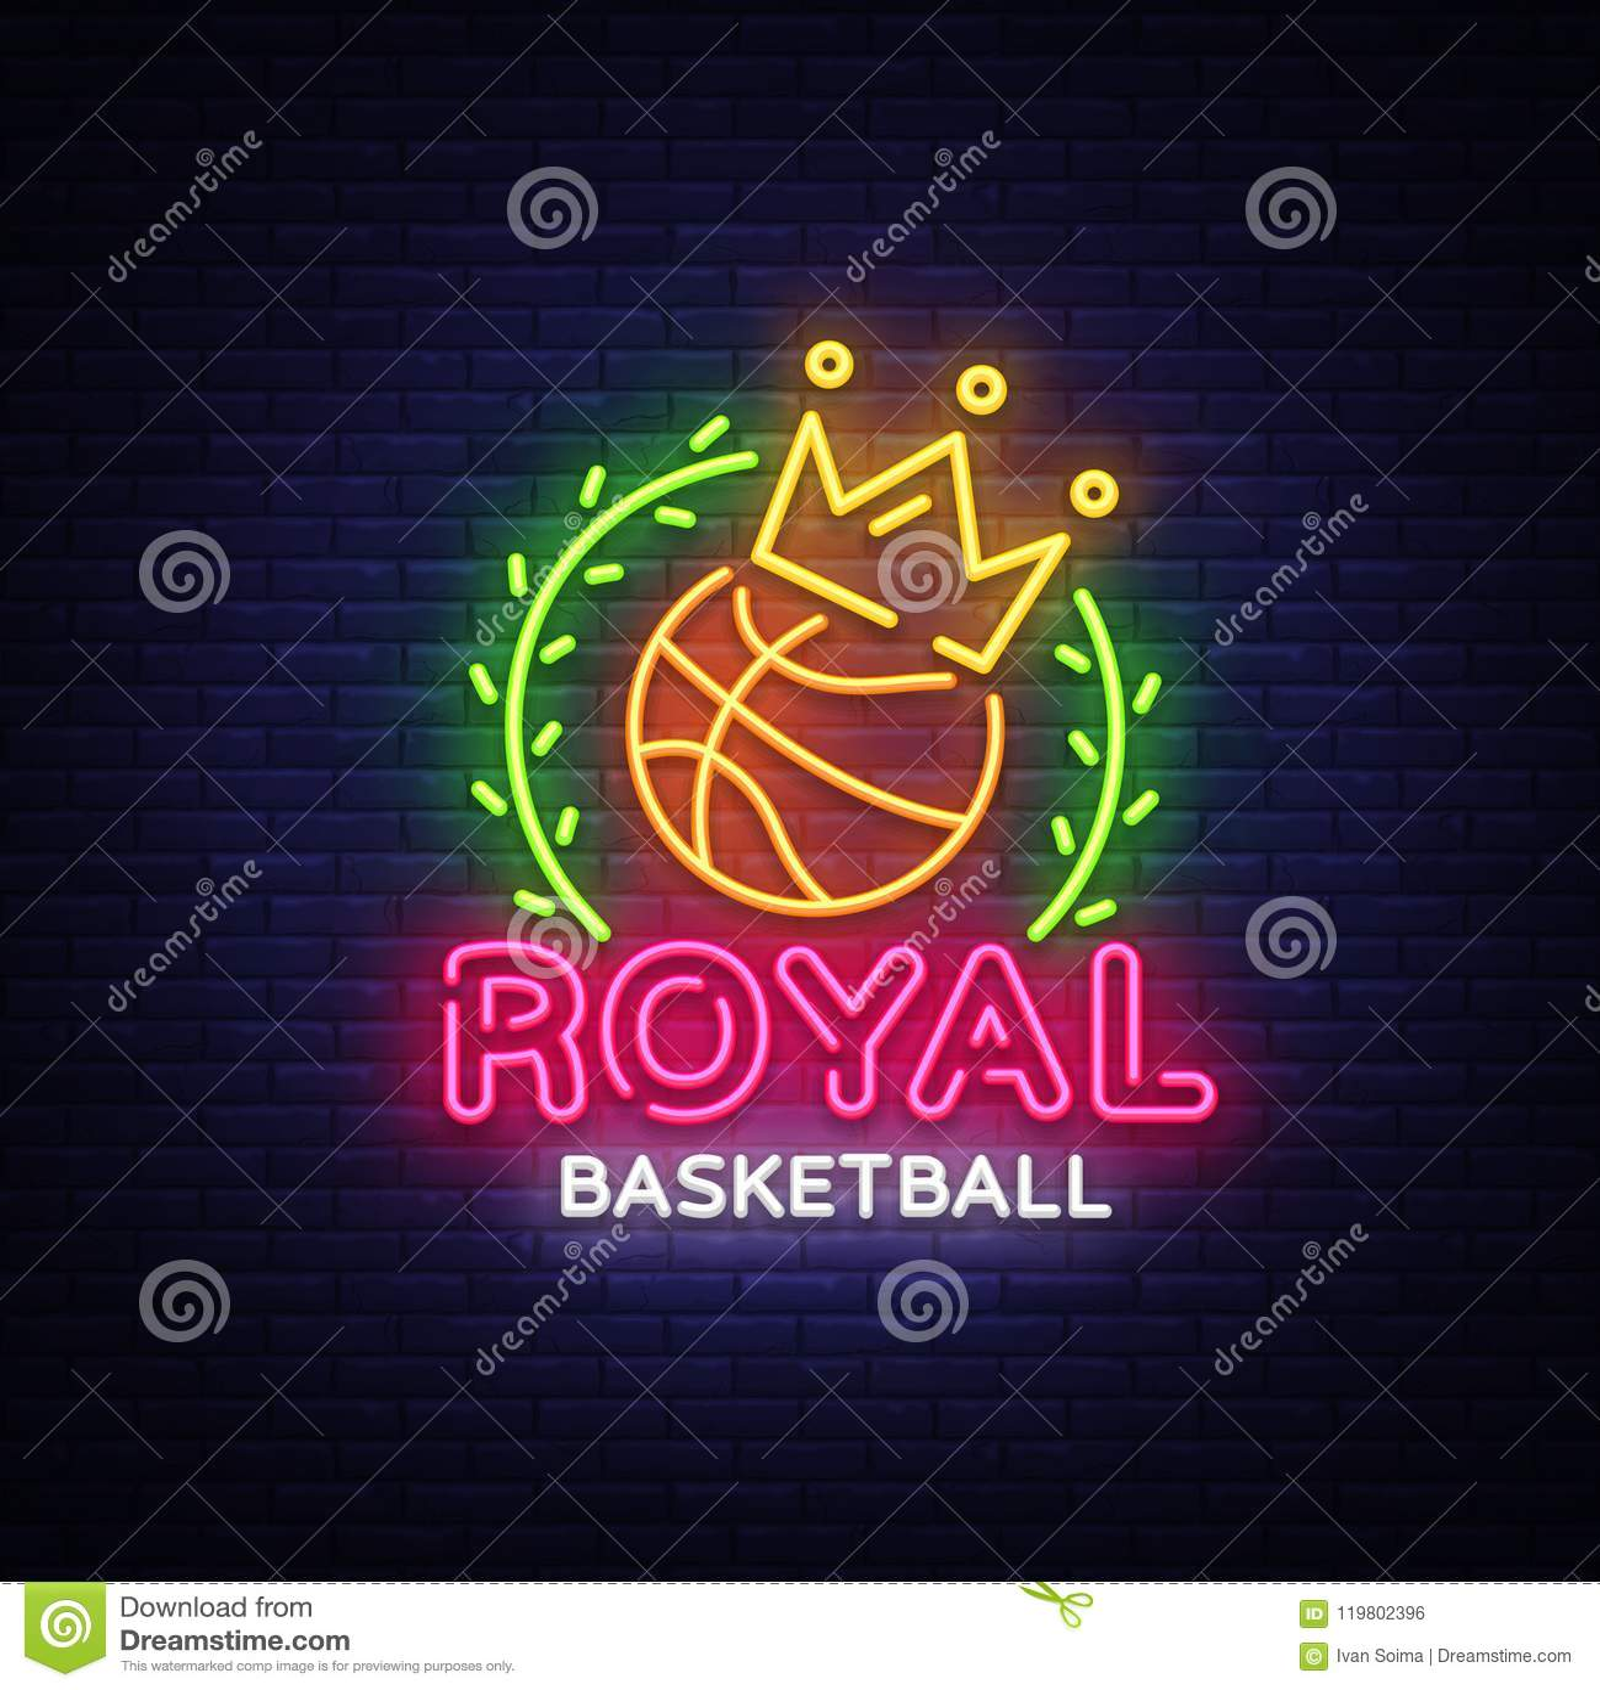 Basketball neon sign vector. Royal Basketball Design template neon sign, light banner, neon signboard, modern trend